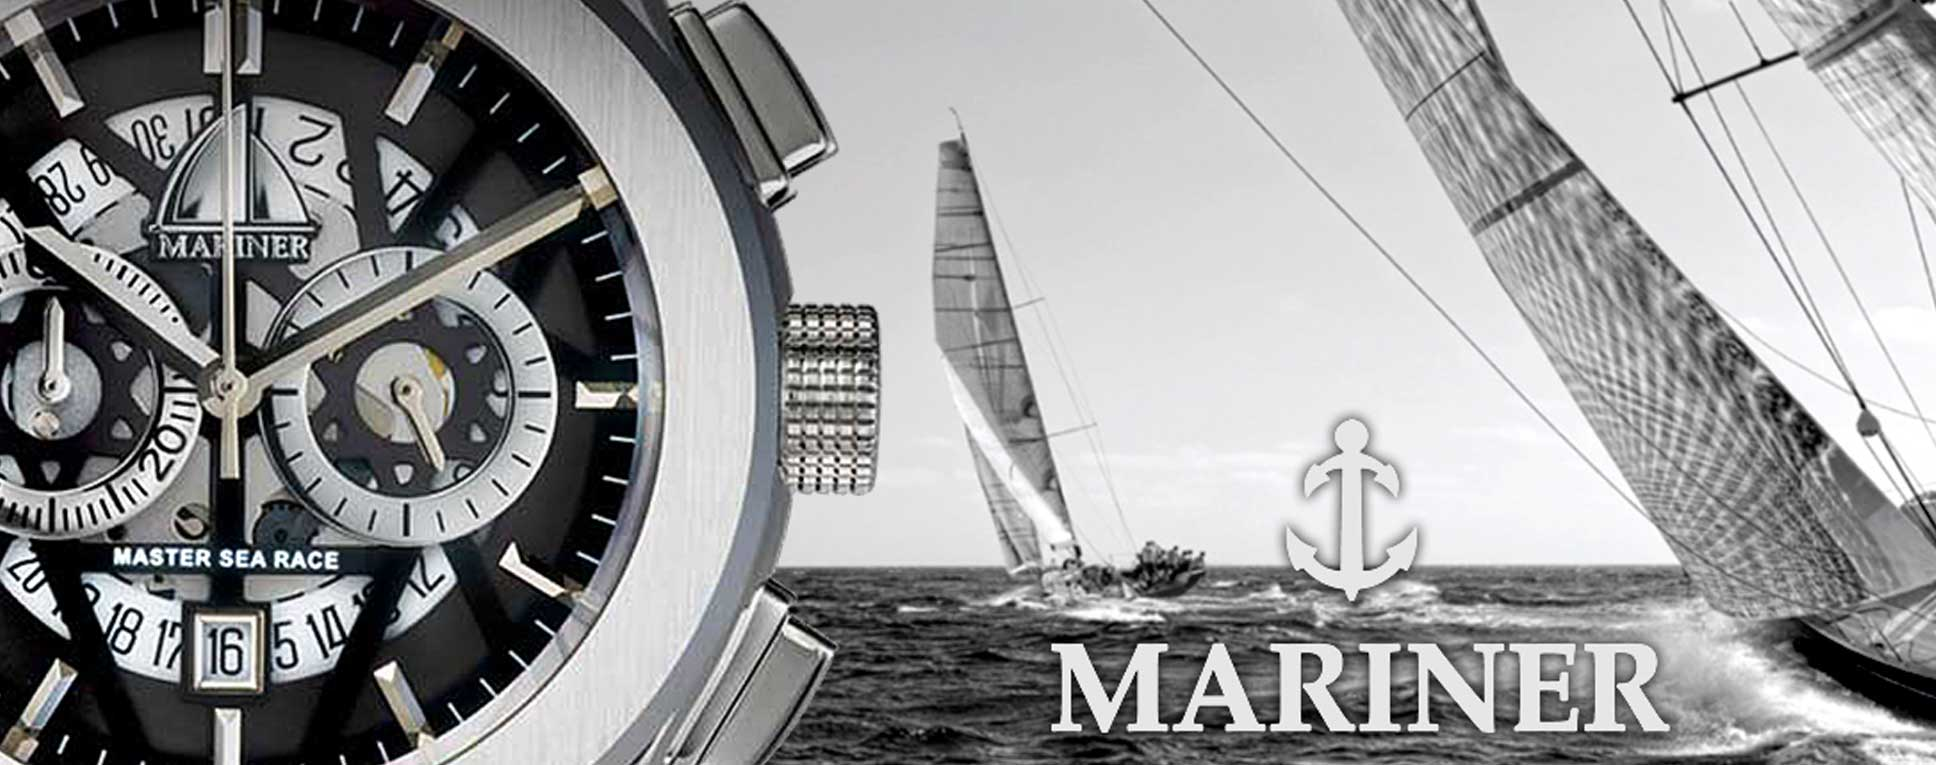 master-sea-race-mobile